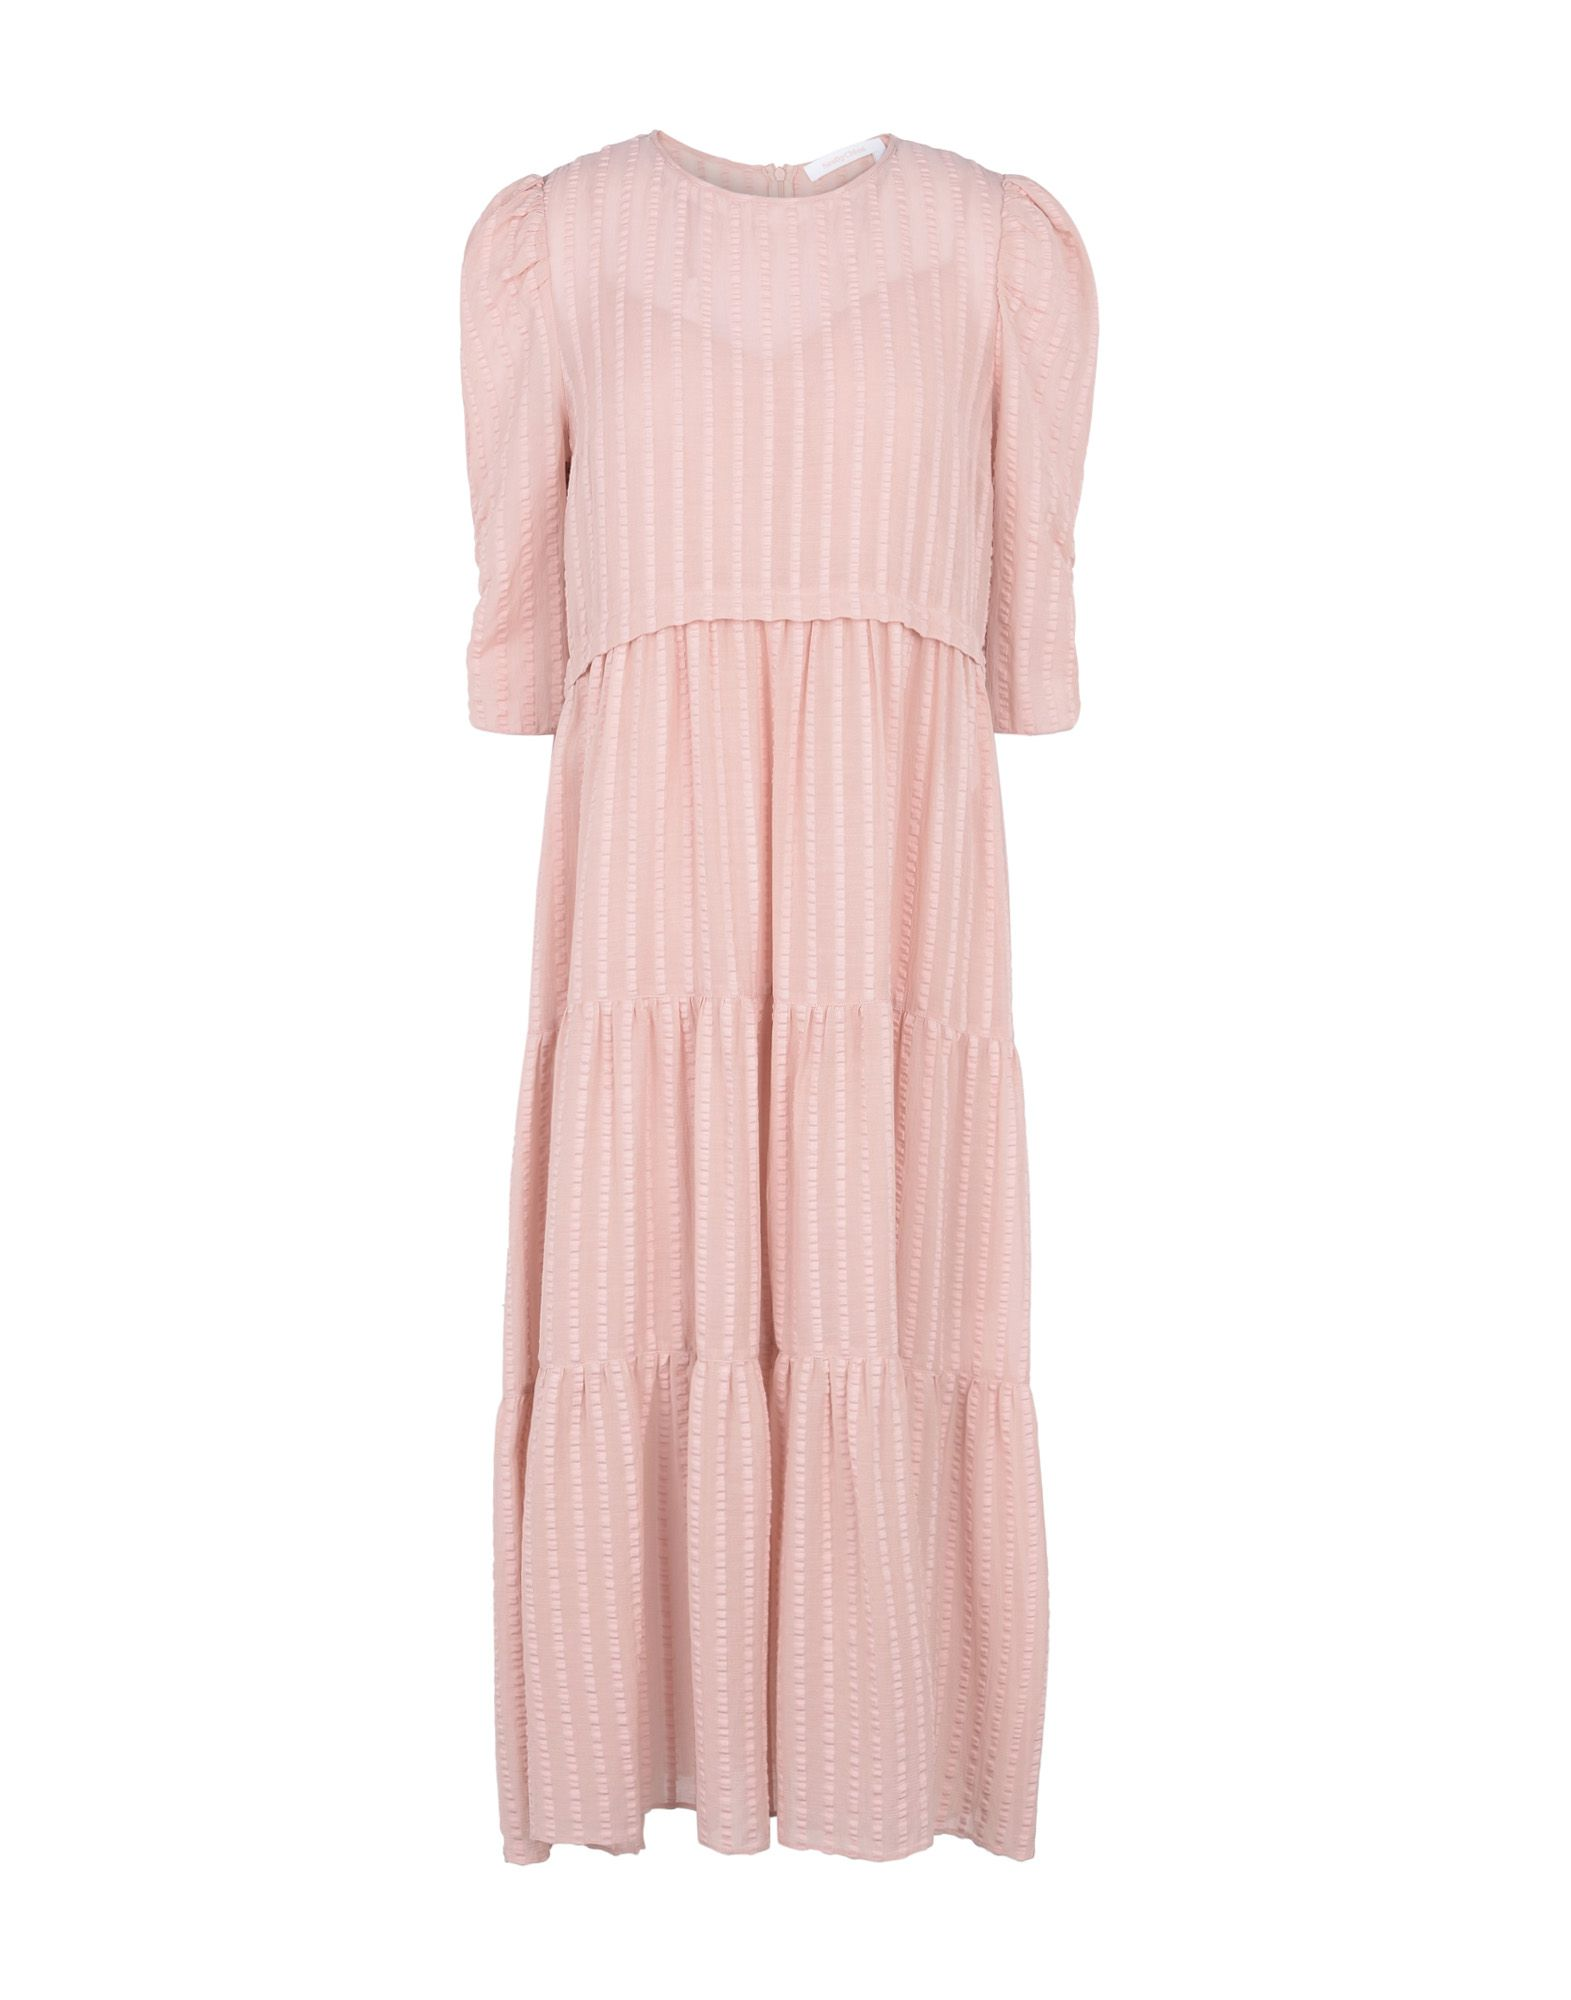 все цены на SEE BY CHLOÉ Платье длиной 3/4 онлайн